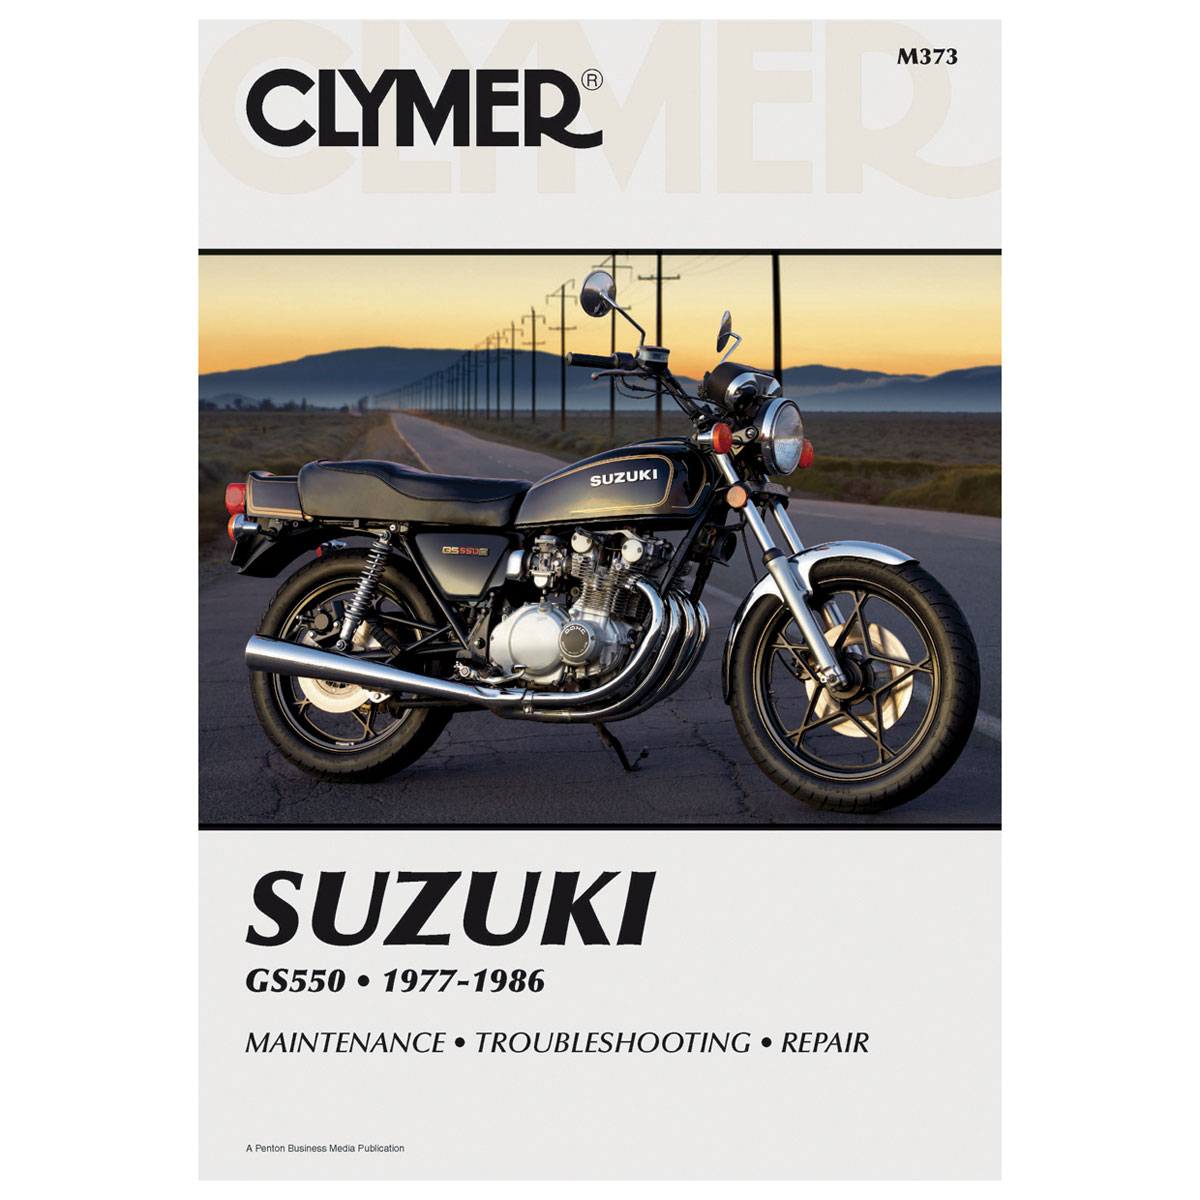 Clymer Suzuki Motorcycle Repair Manual - M373